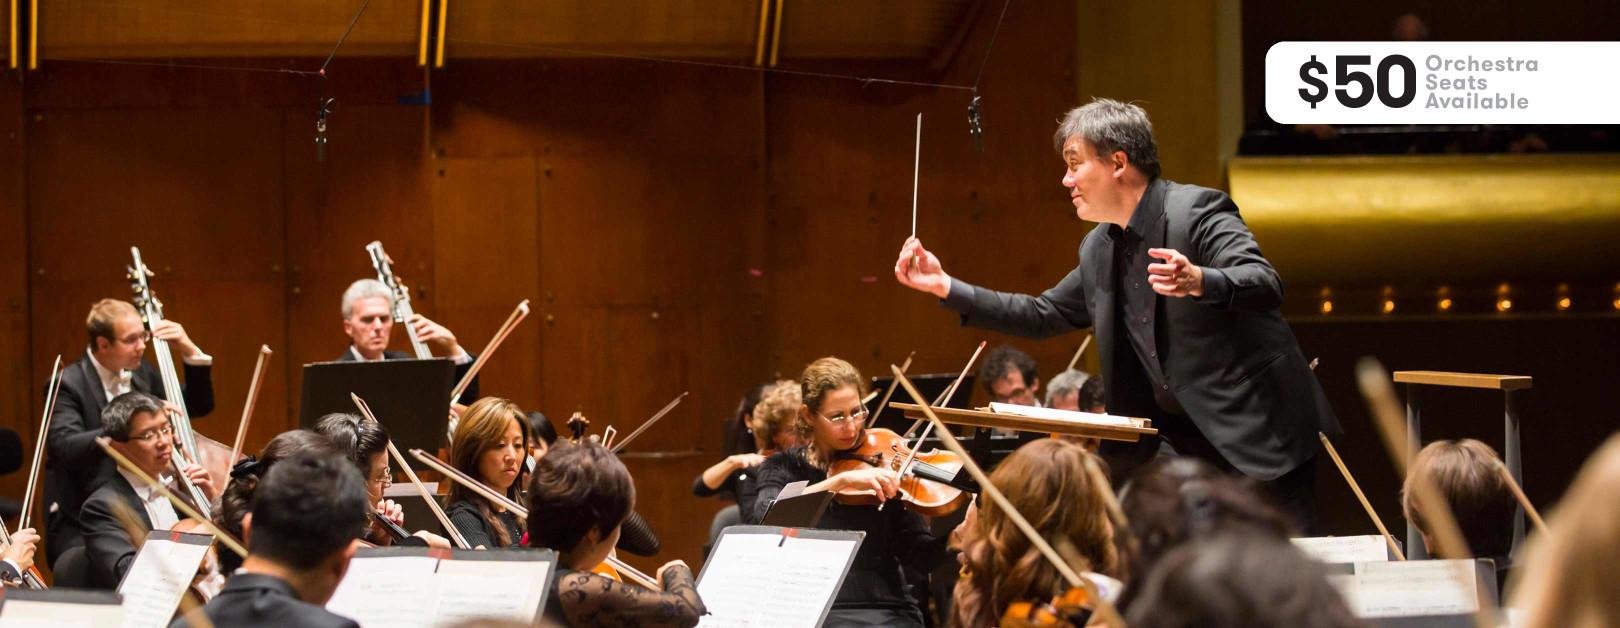 Mahler's Symphony No. 4